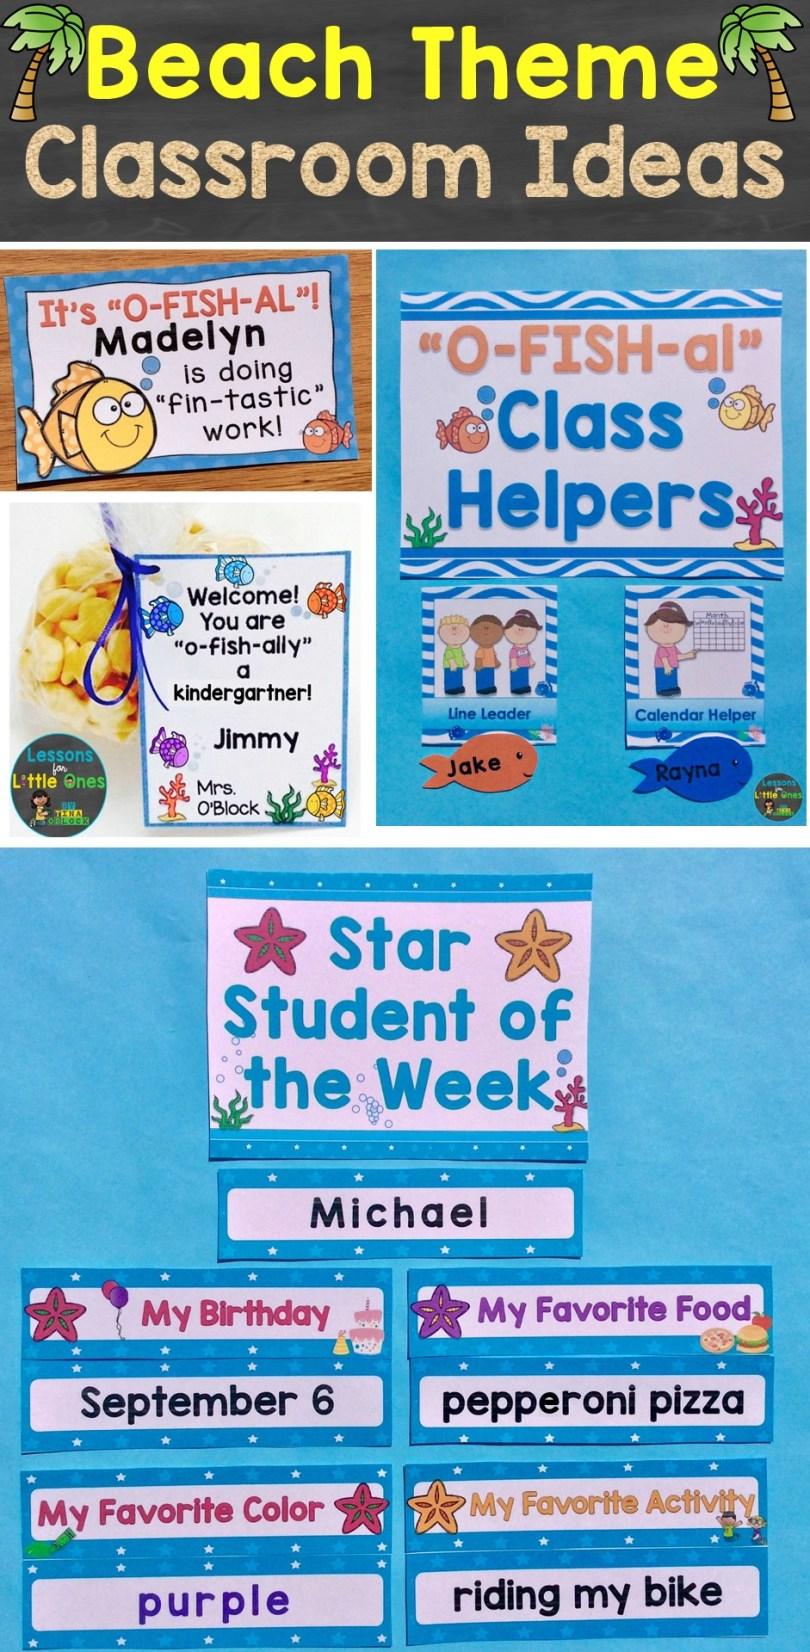 beach theme classroom ideas & first day of school activities